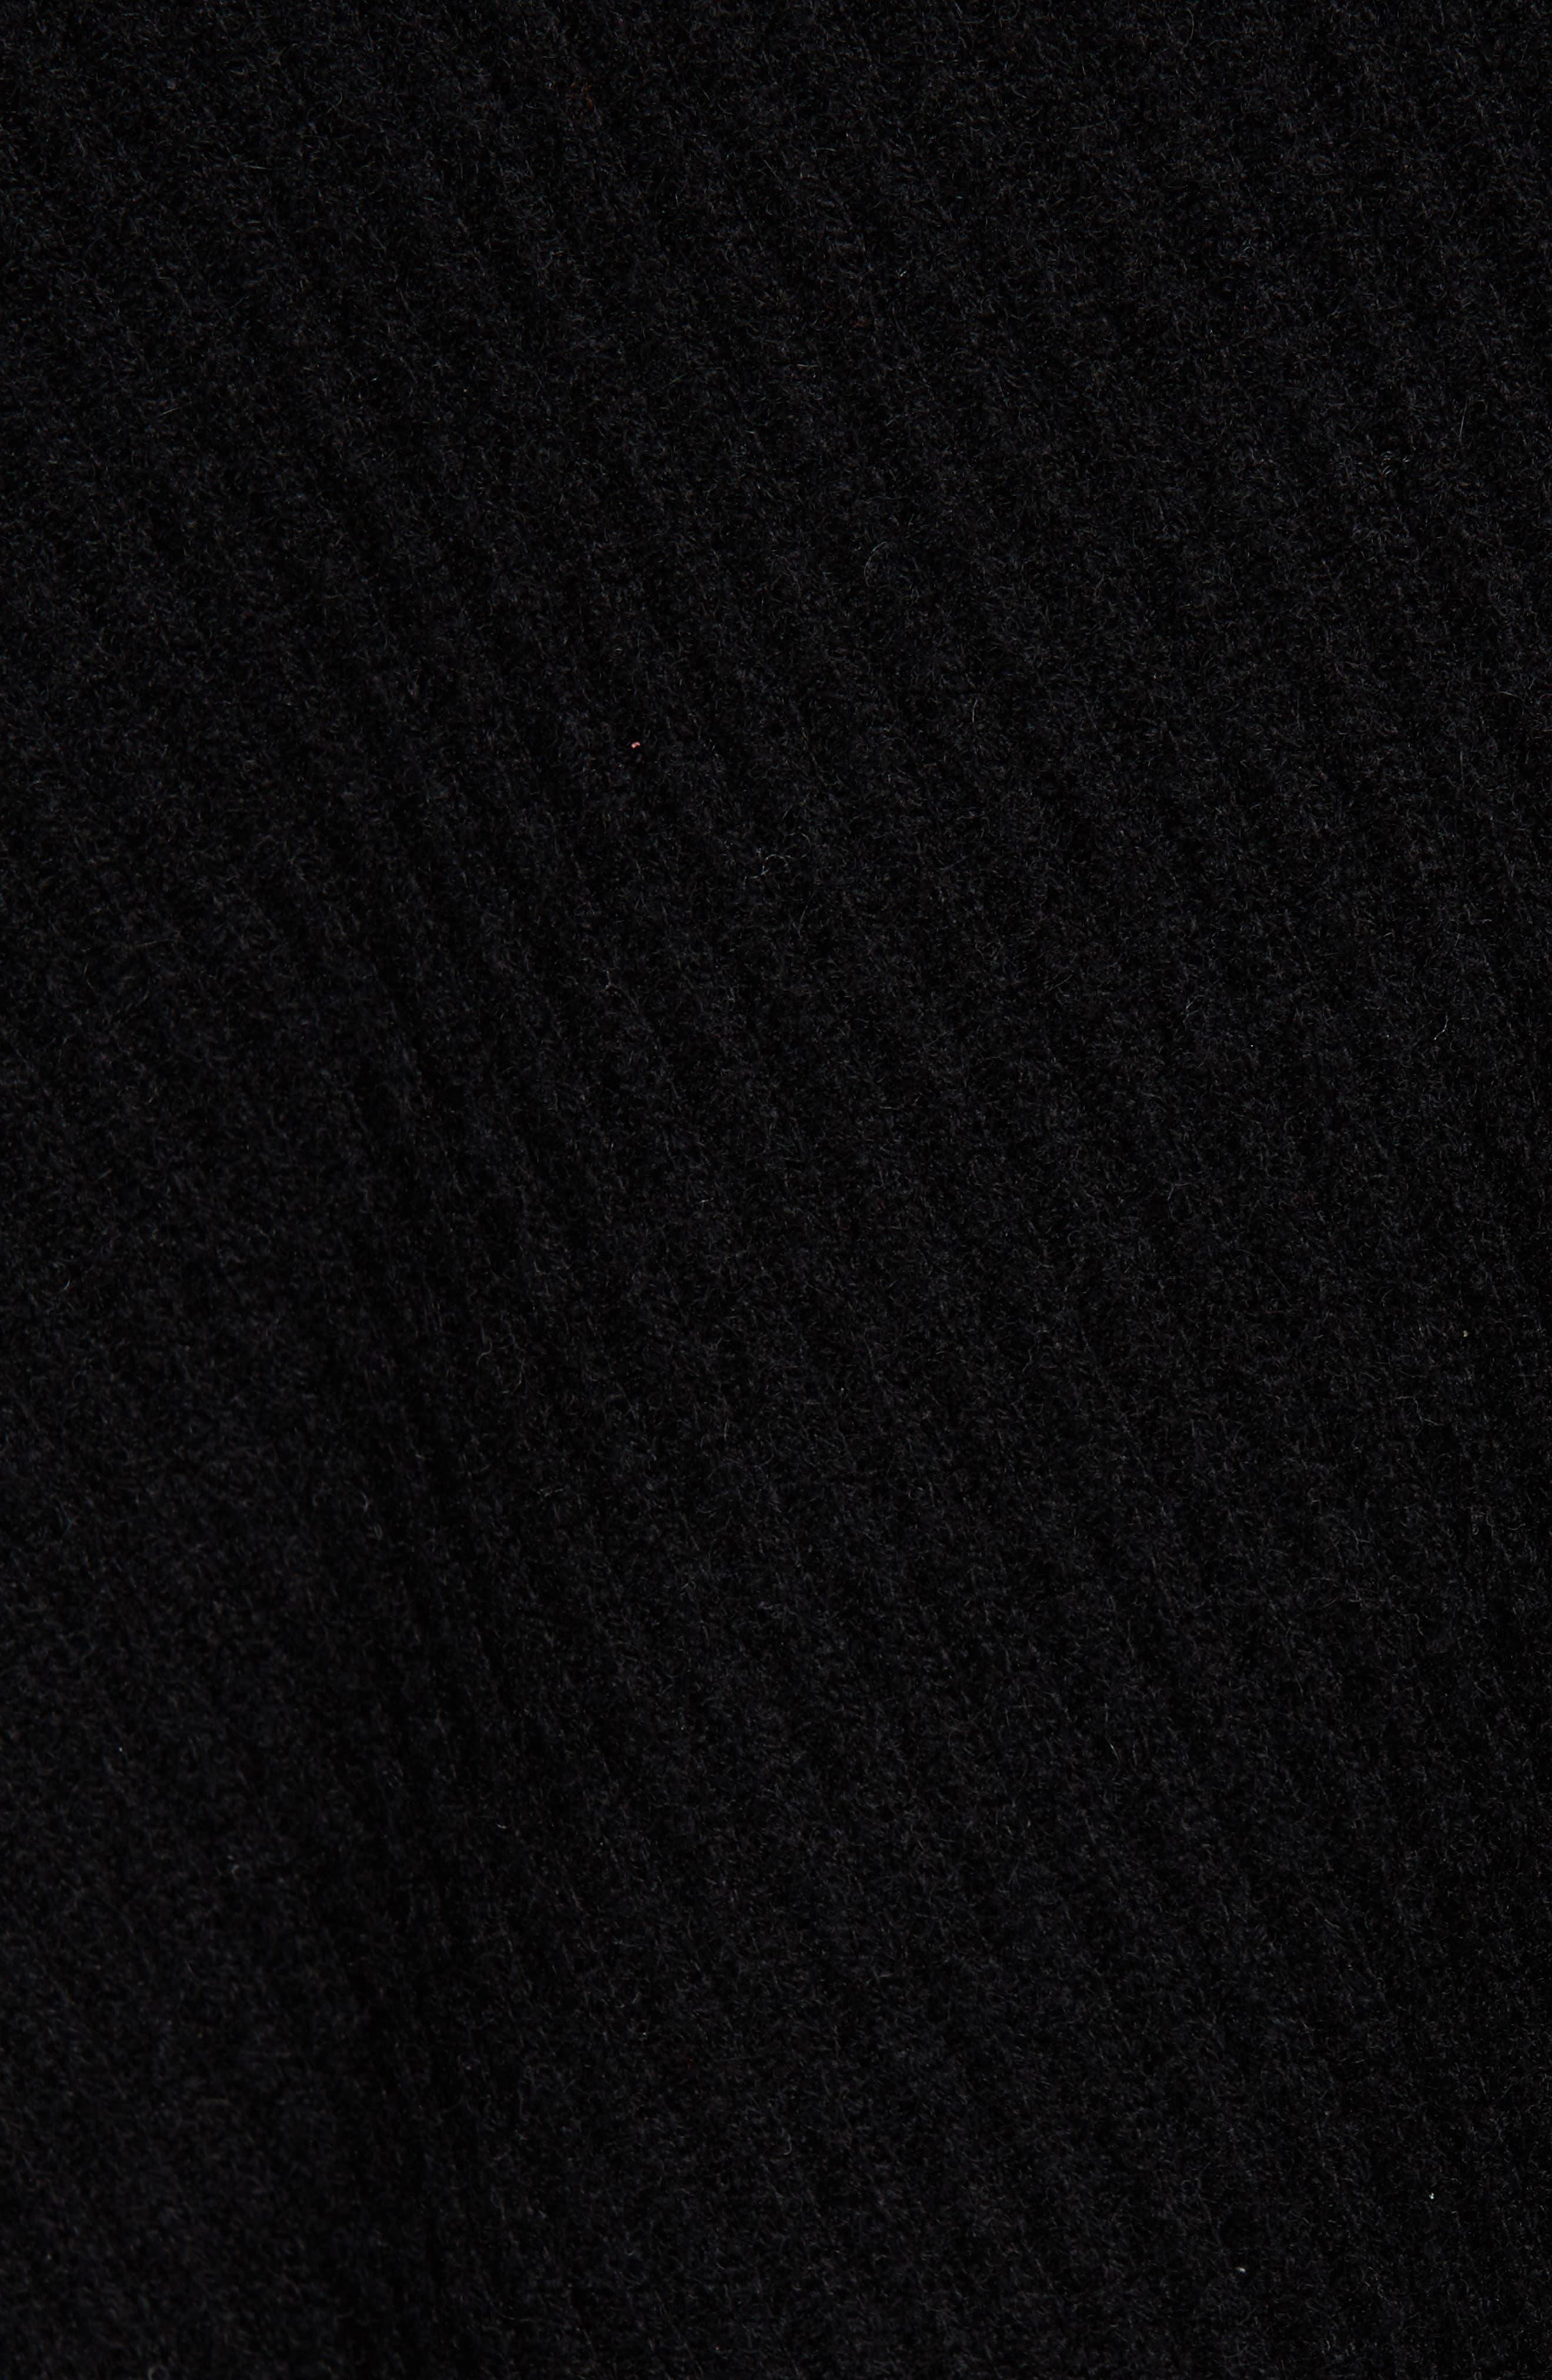 NORDSTROM SIGNATURE, Chevron Cashmere Cardigan, Alternate thumbnail 6, color, 001